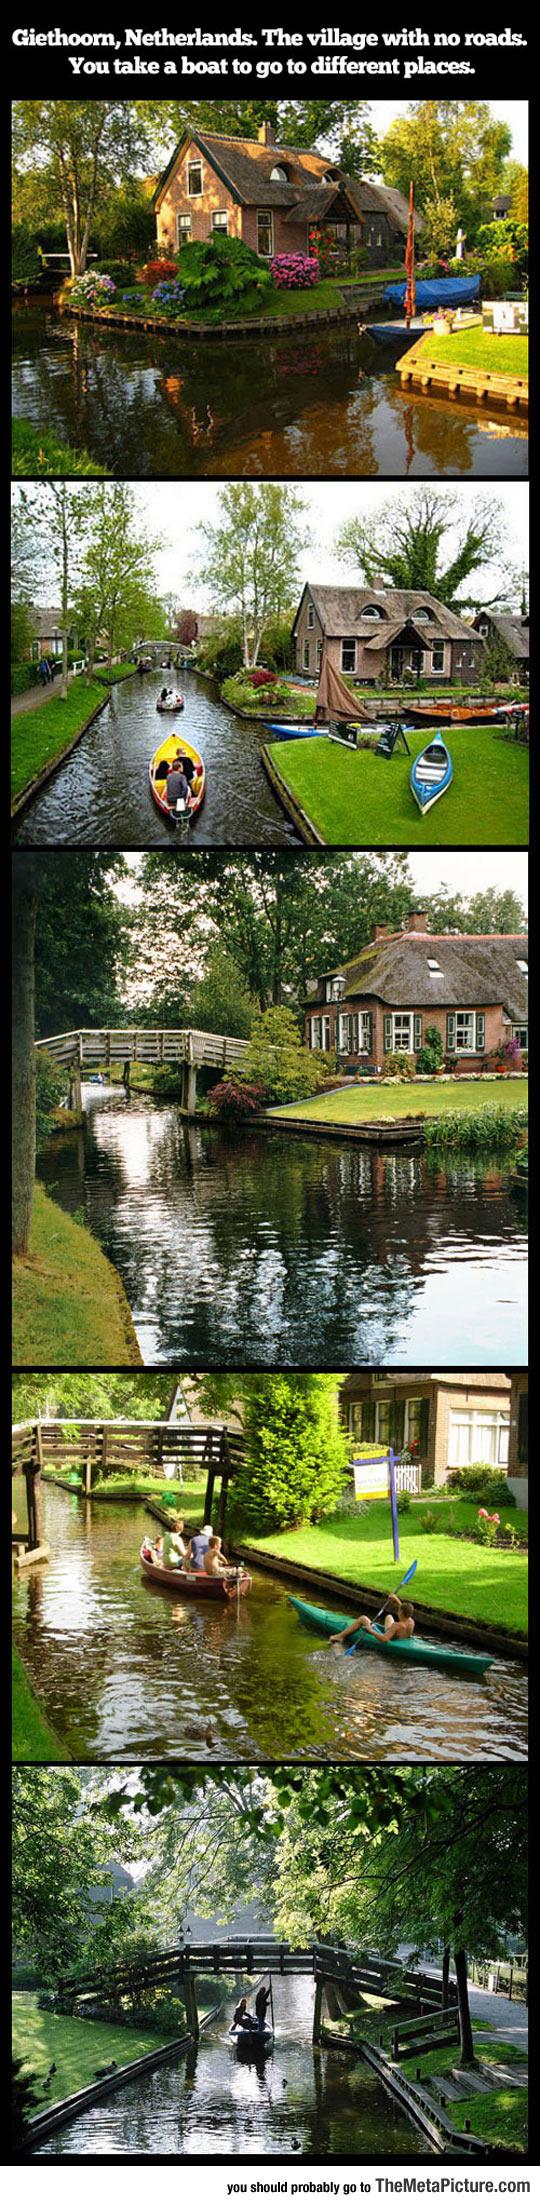 travel-Netherlands-village-no-roads-water-boat